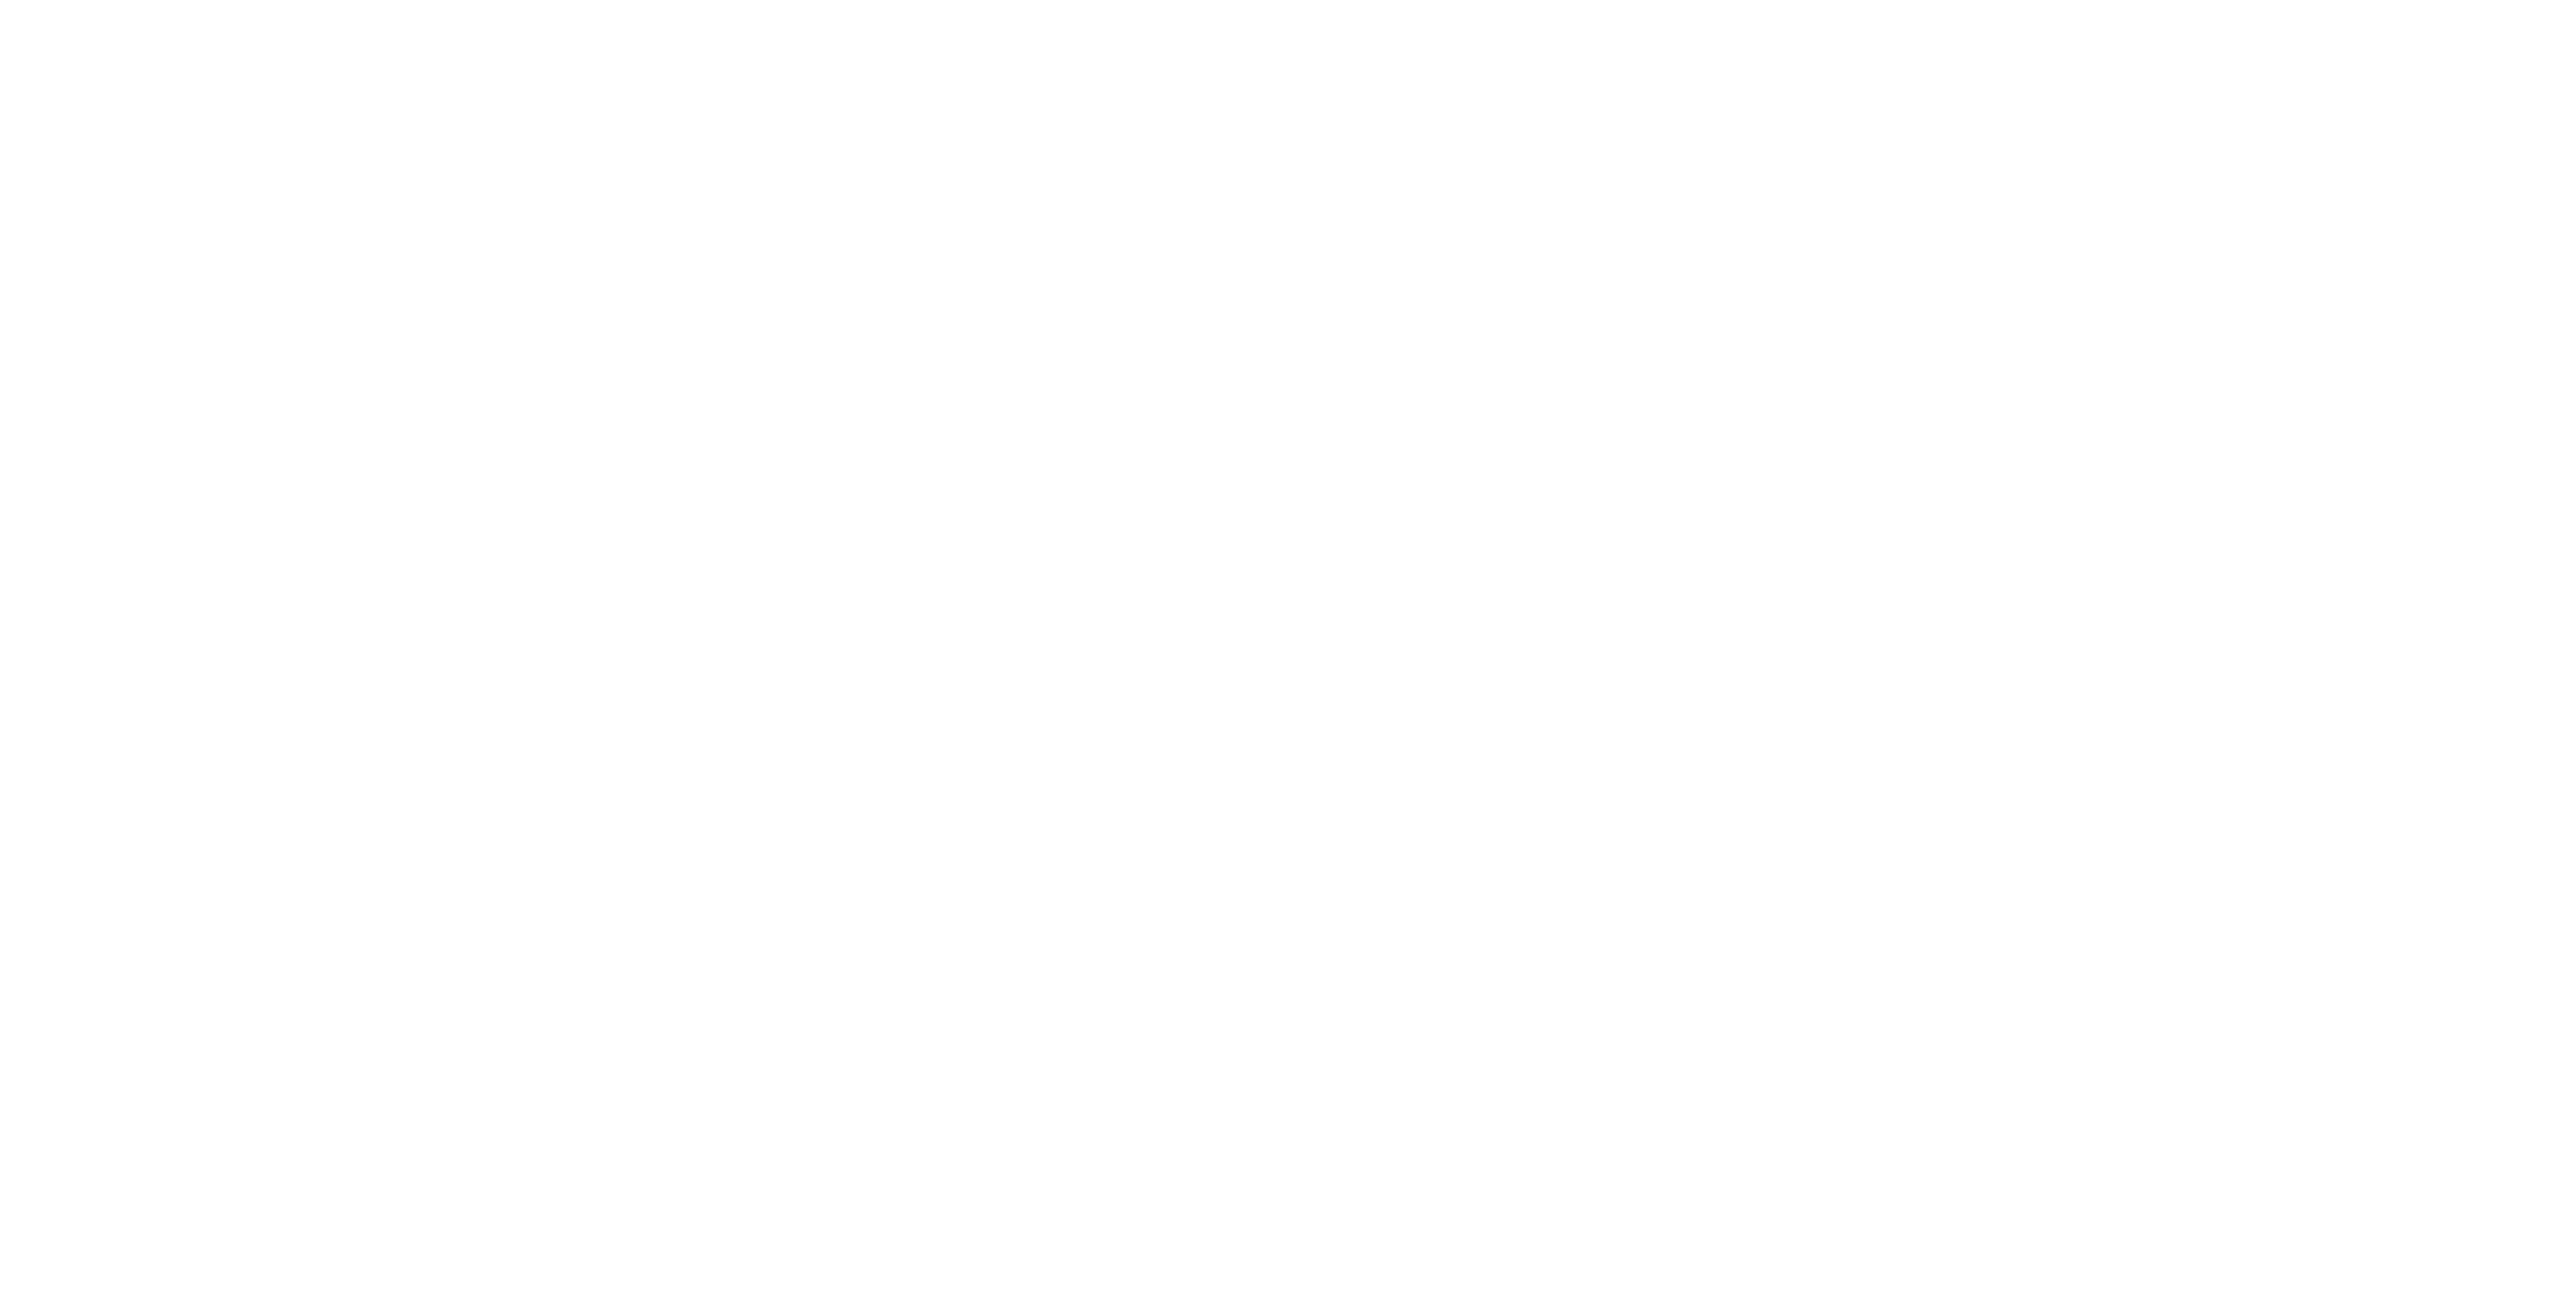 Kungsleden logga